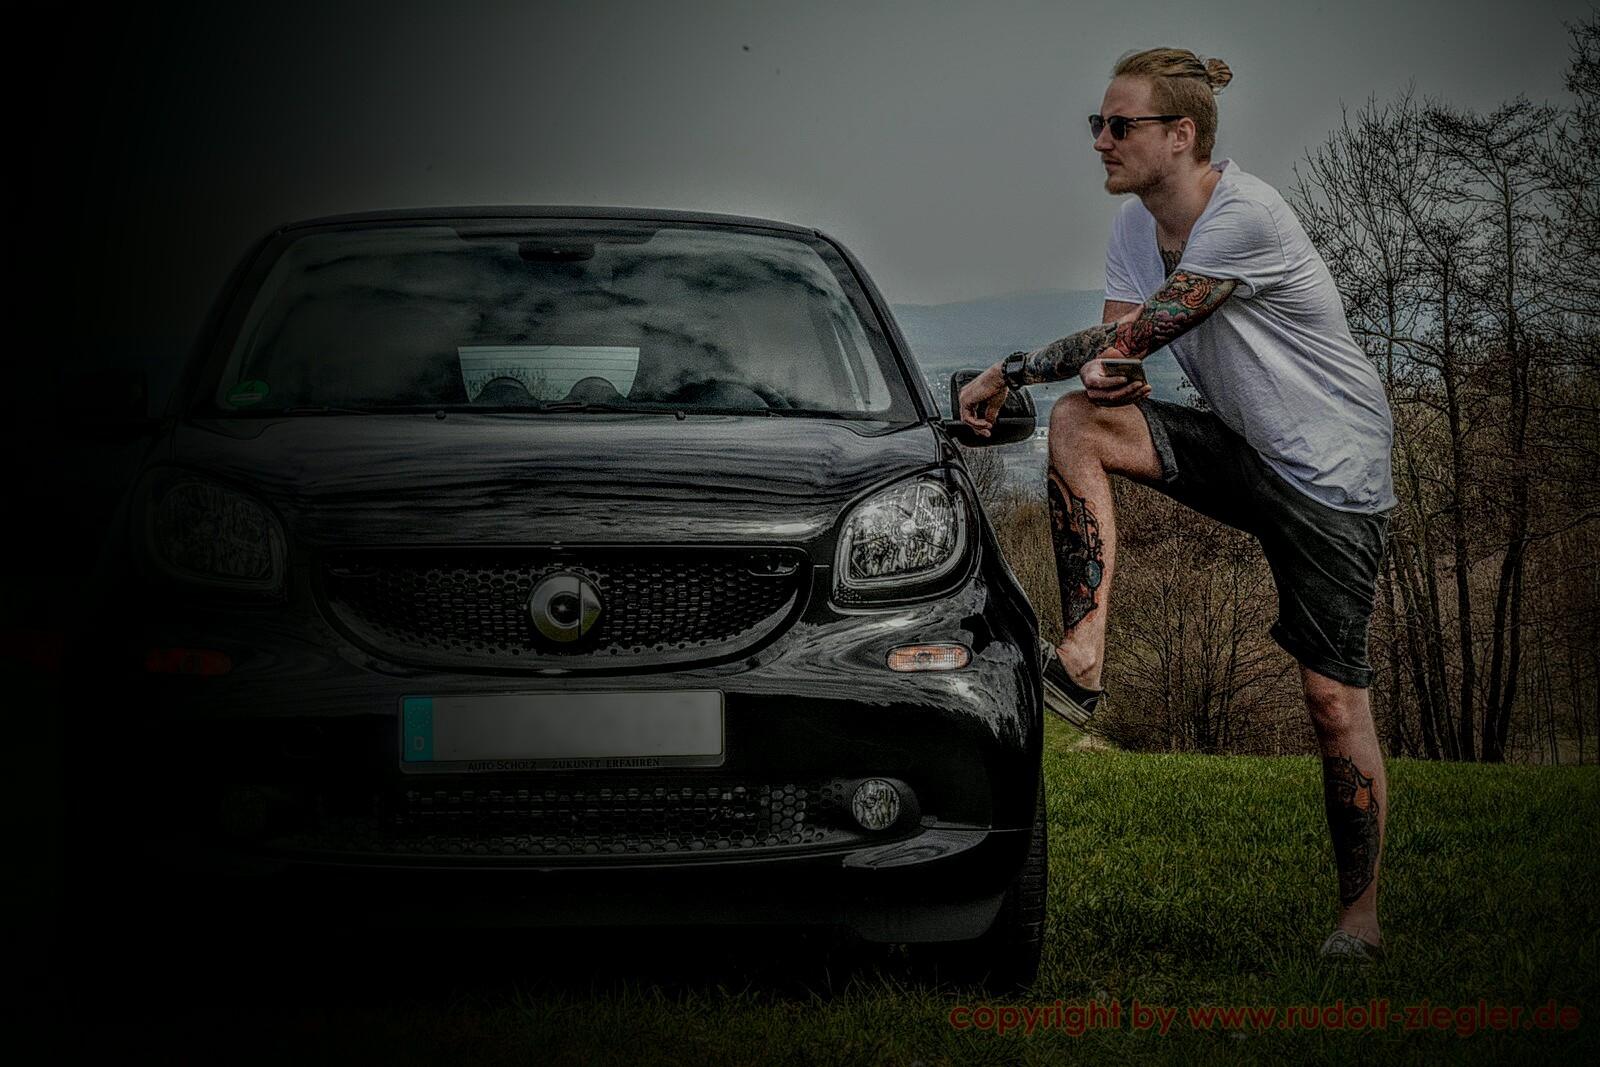 Fotoshooting-SMART-meets-MARTIN-010-Bearbeitet-1600x1200-Bearbeitet